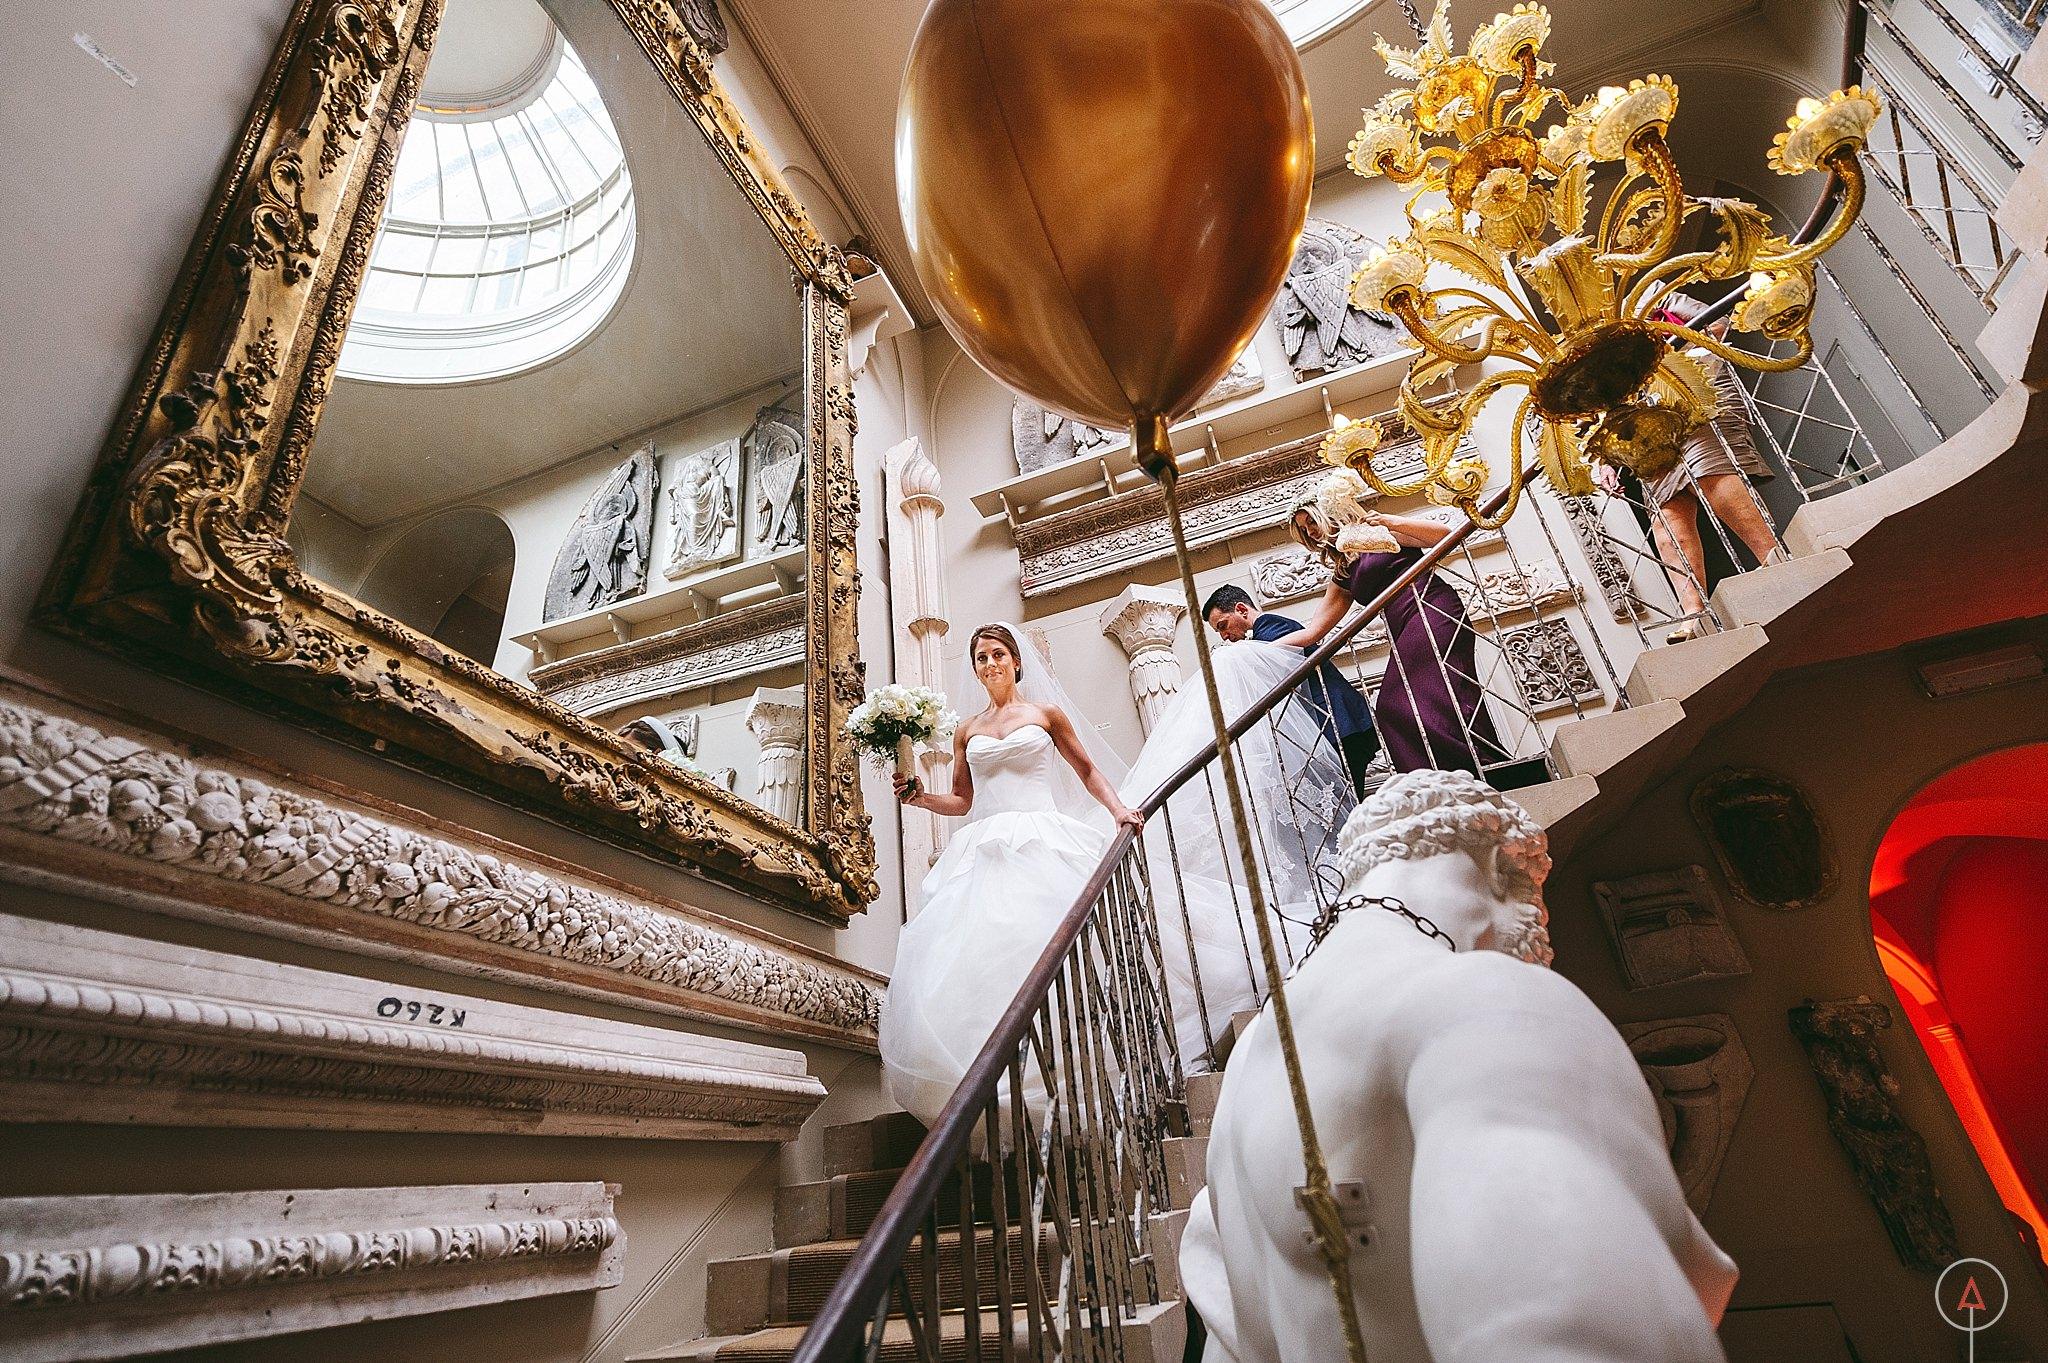 cardiff-wedding-photographer-aga-tomaszek_0245